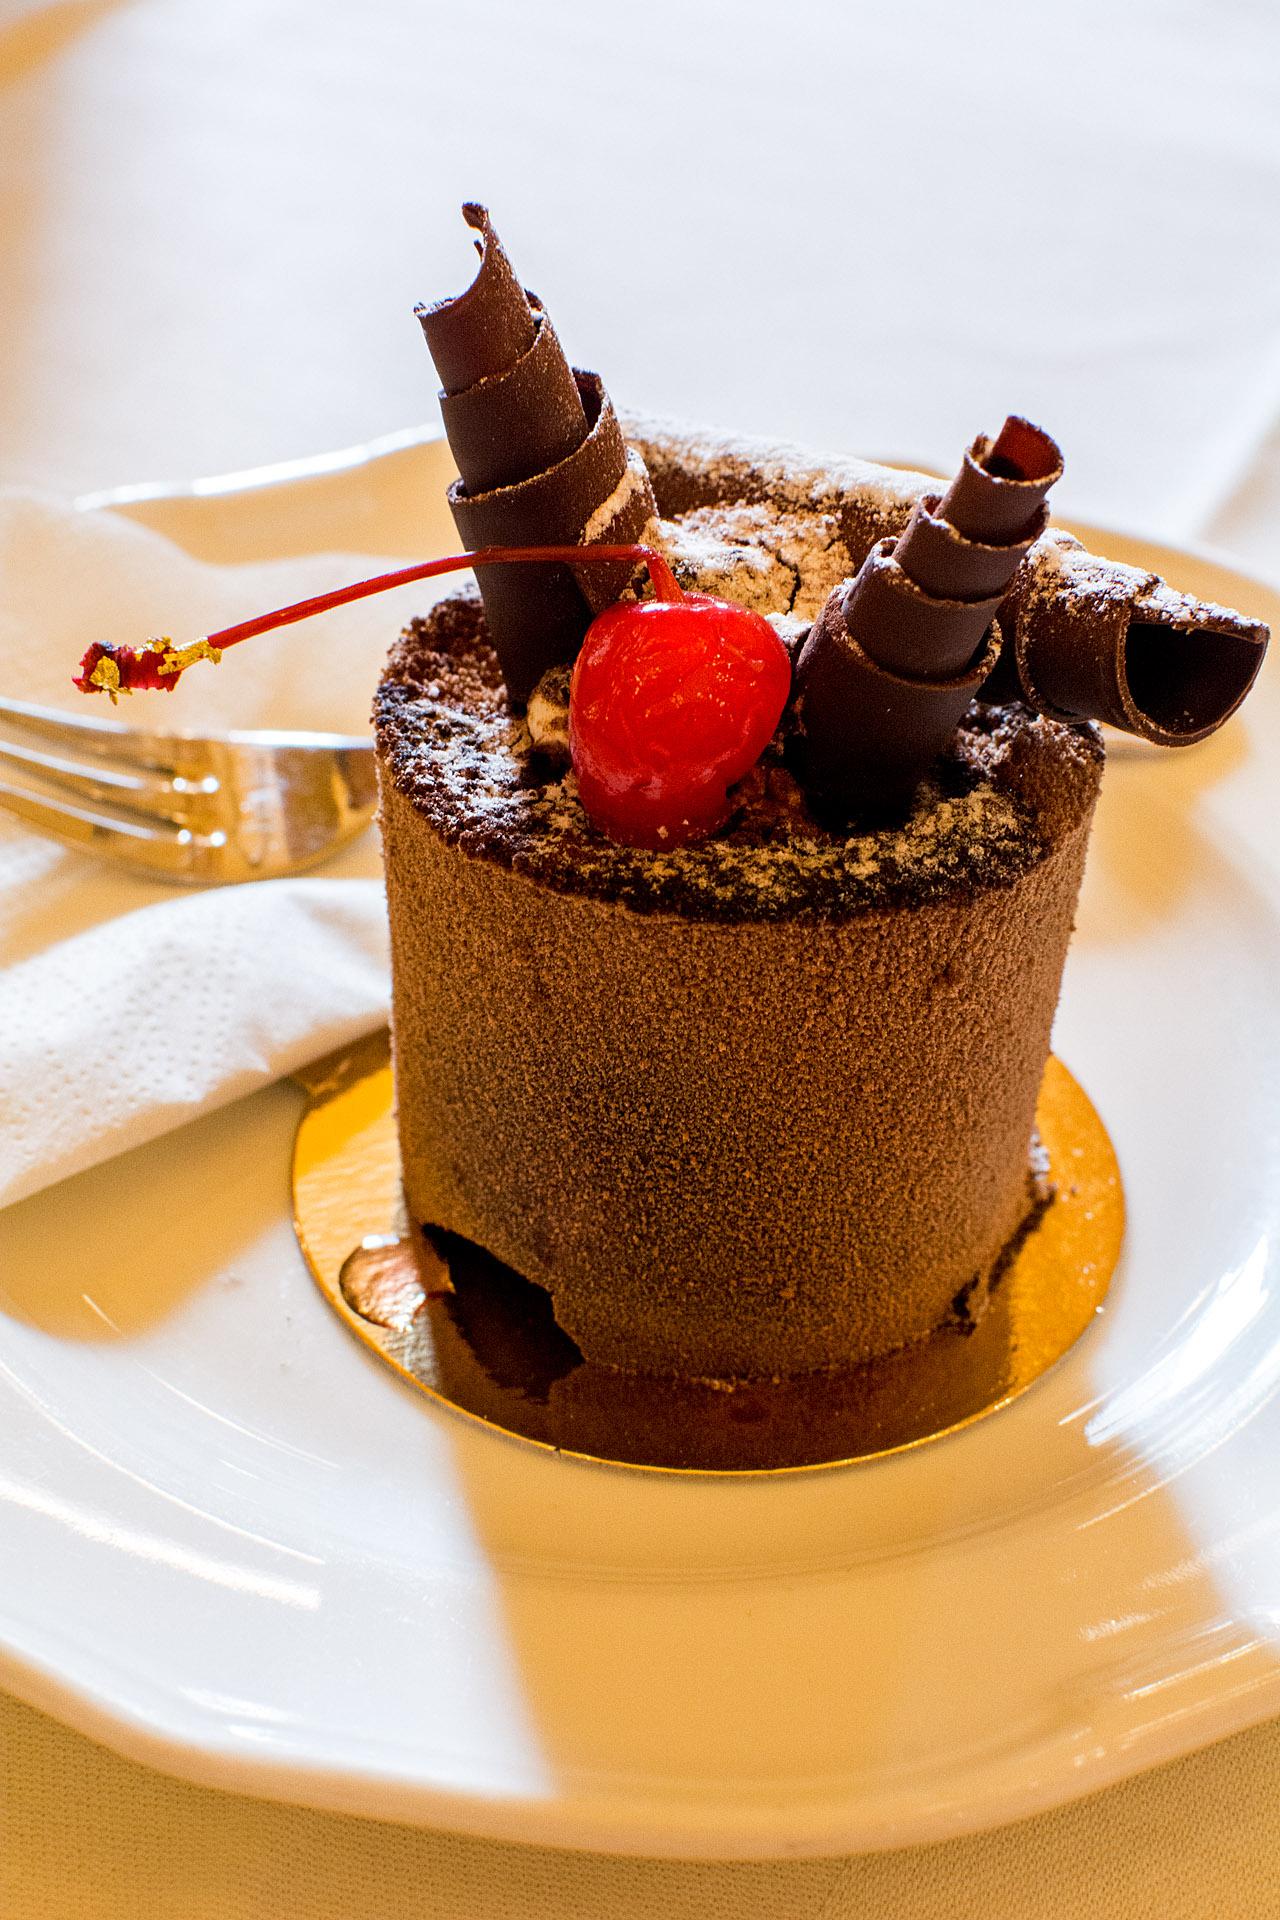 Chocolate cherry mousse